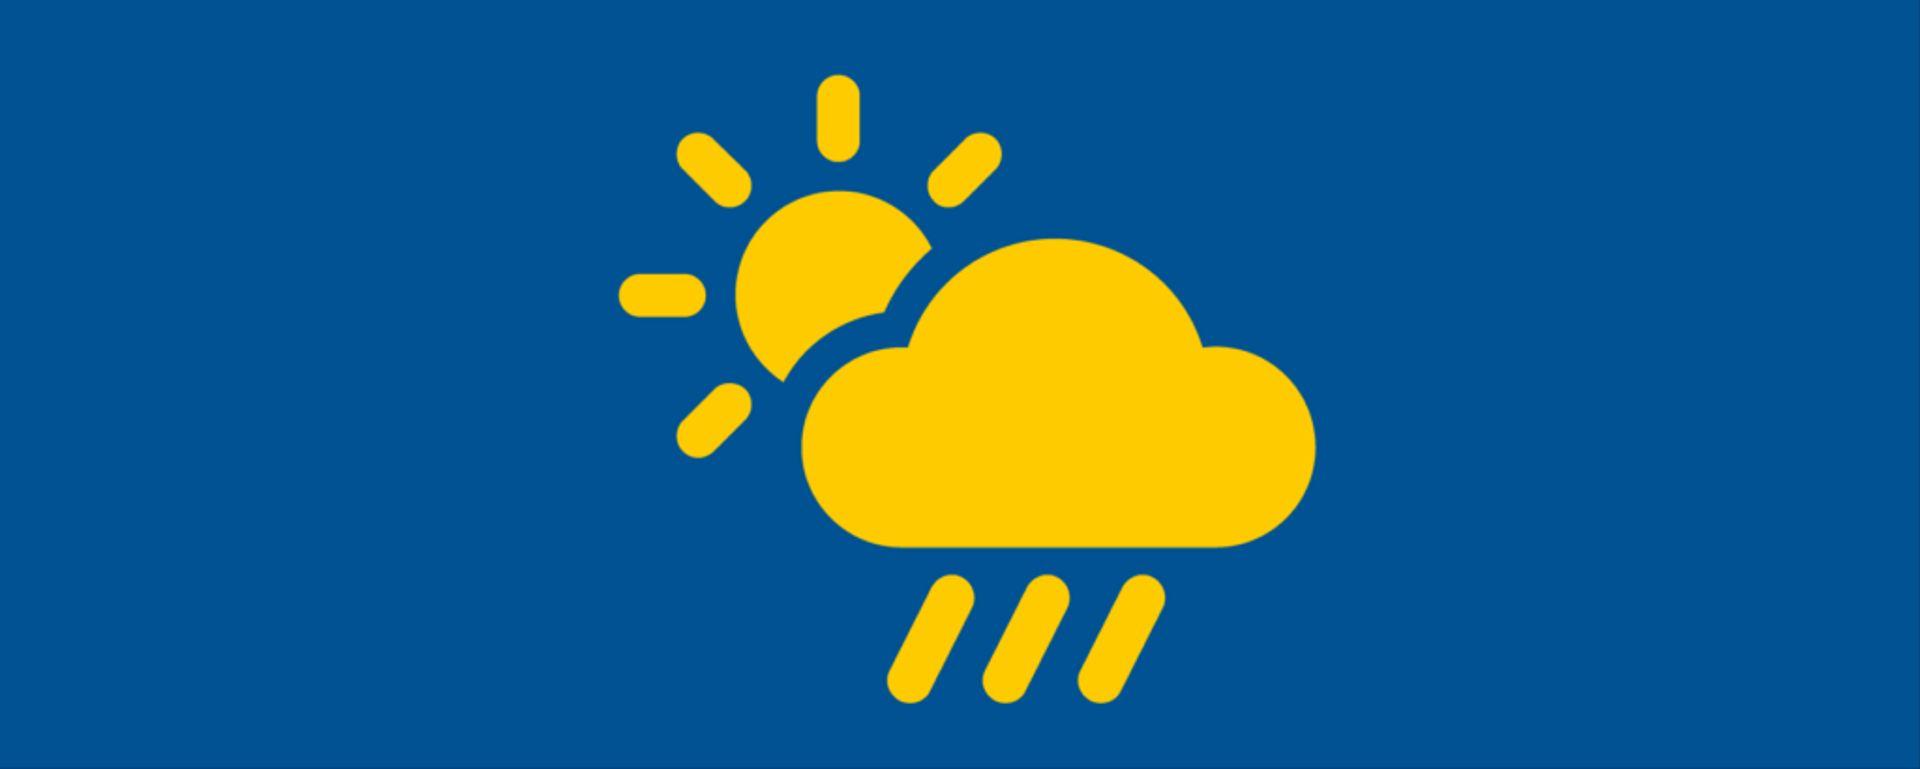 Photo showing illustration of sun, cloud and rain